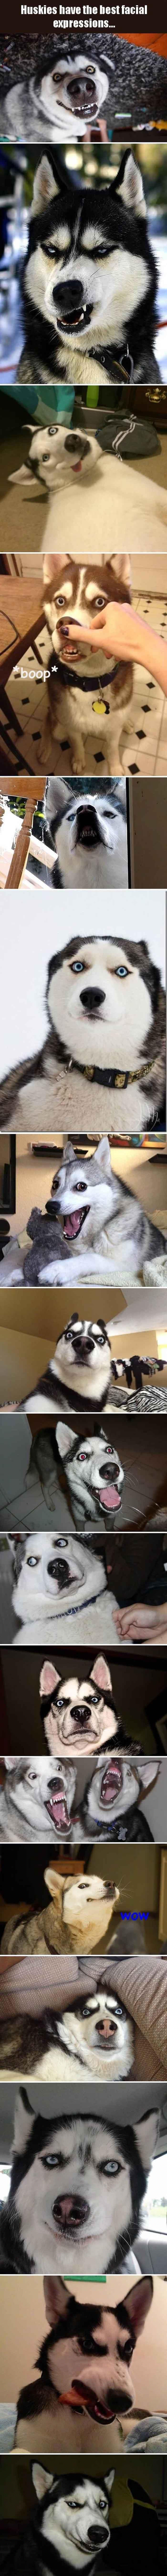 The 2nd picture looks like a Siberian Husky Elvis. lol